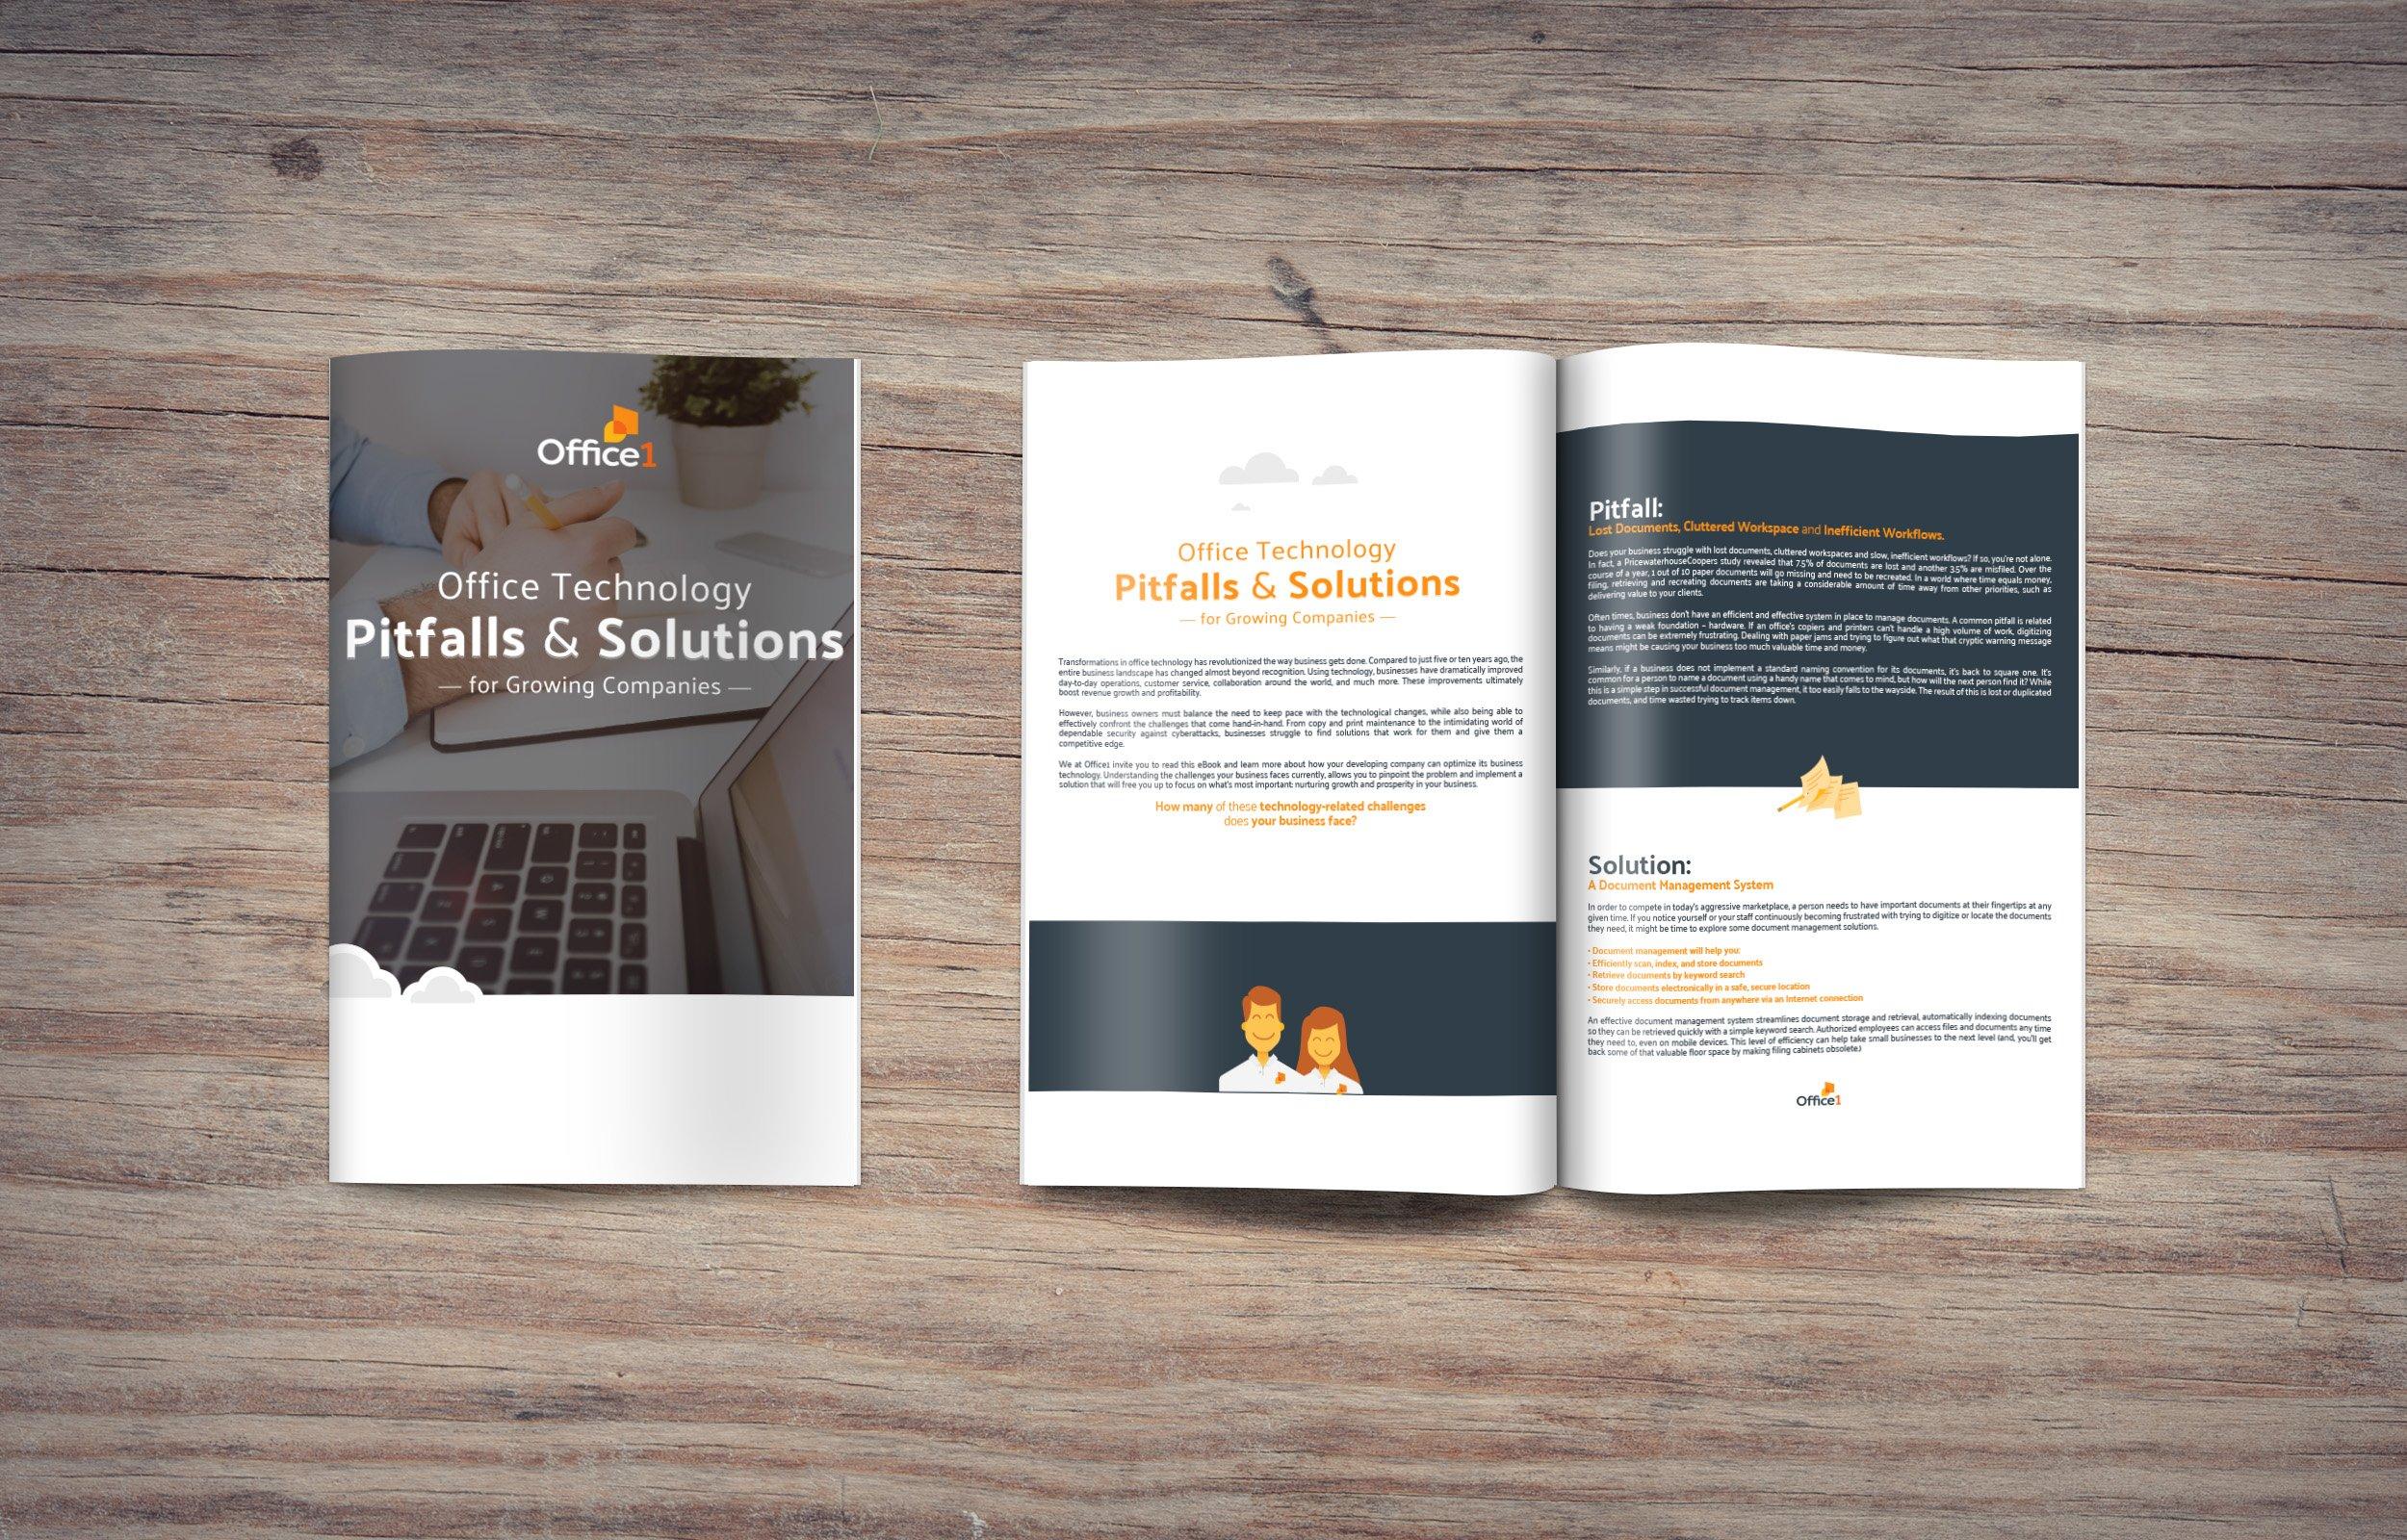 Office Technology Pitfalls & Solutions eBook |  Office 1